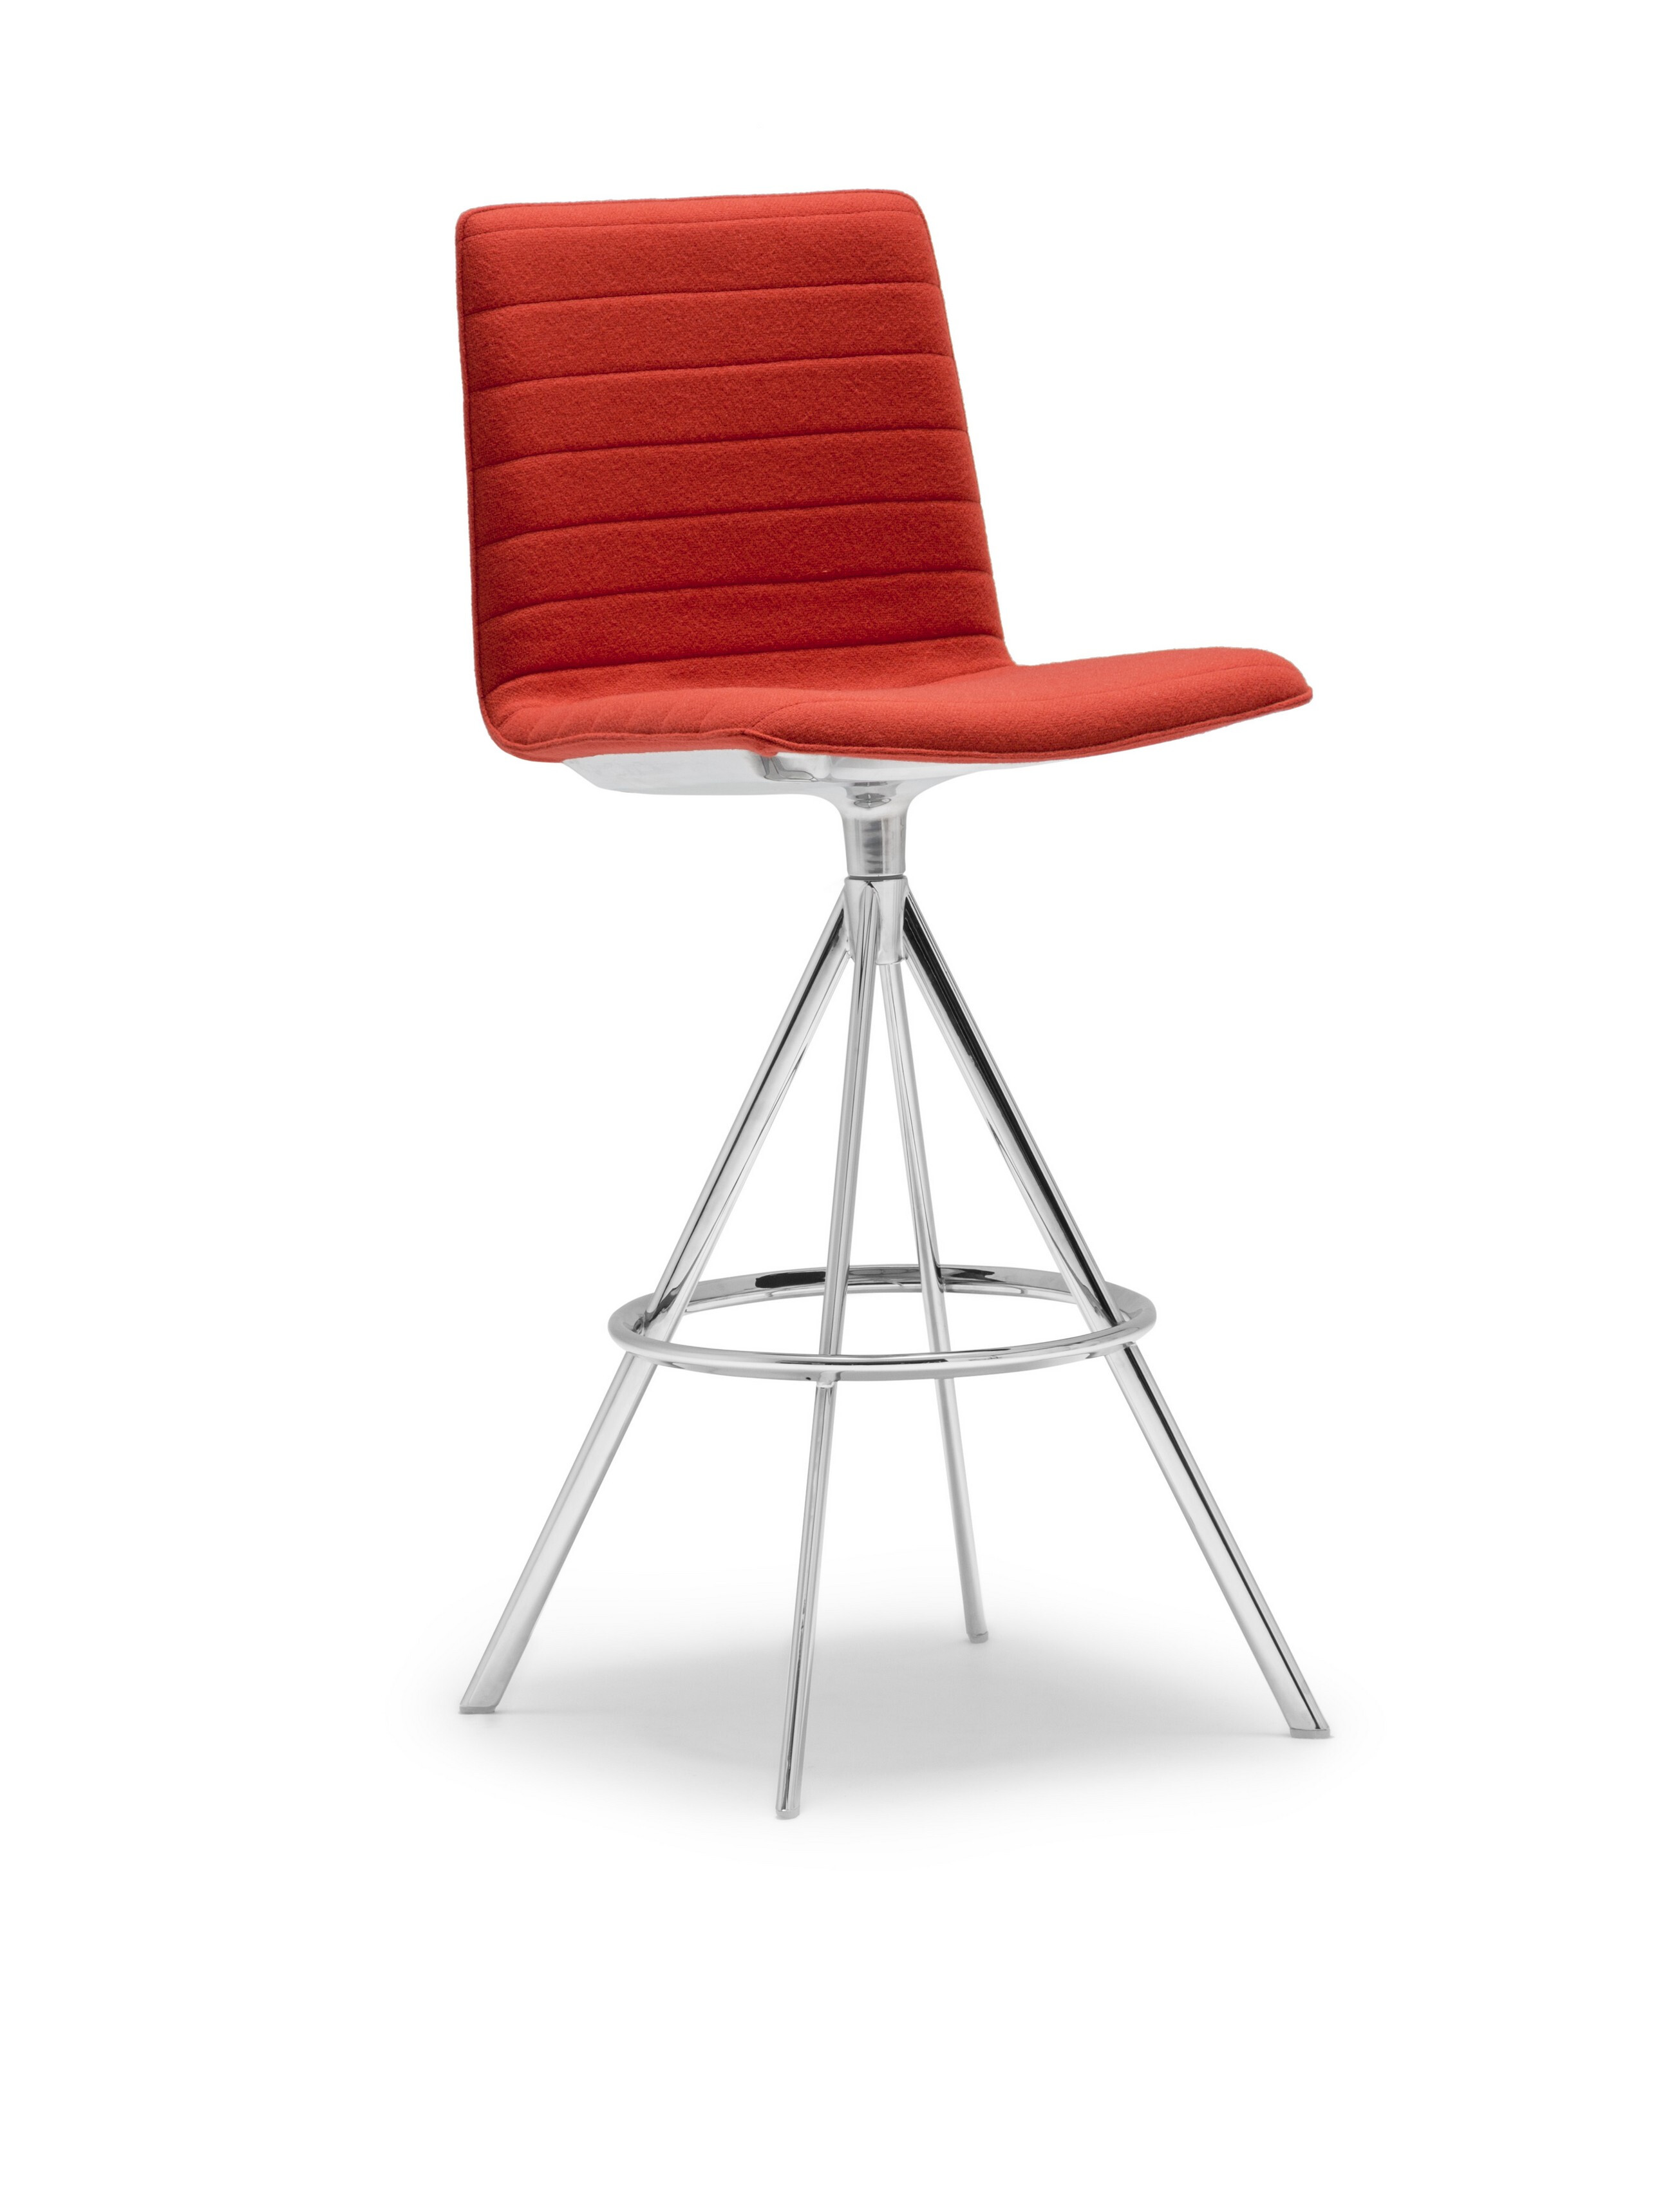 Flex stool + stackable chair